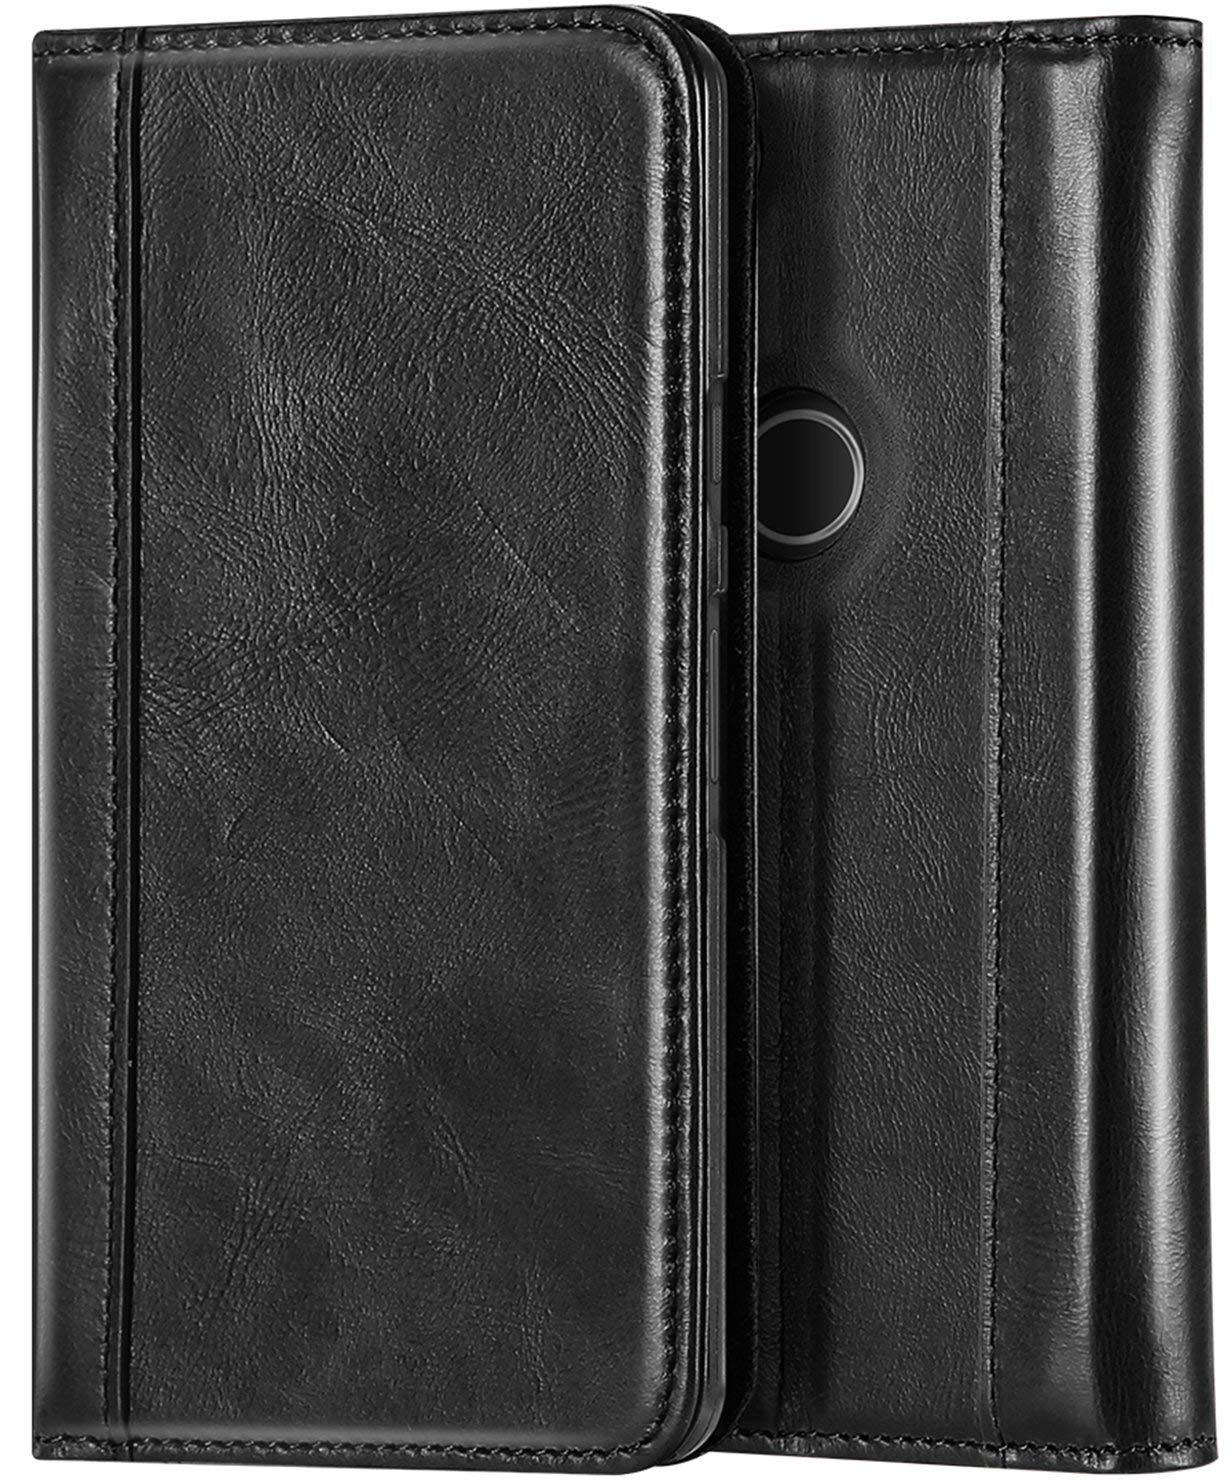 pixel-3-procase-genuine-leather-case-pre